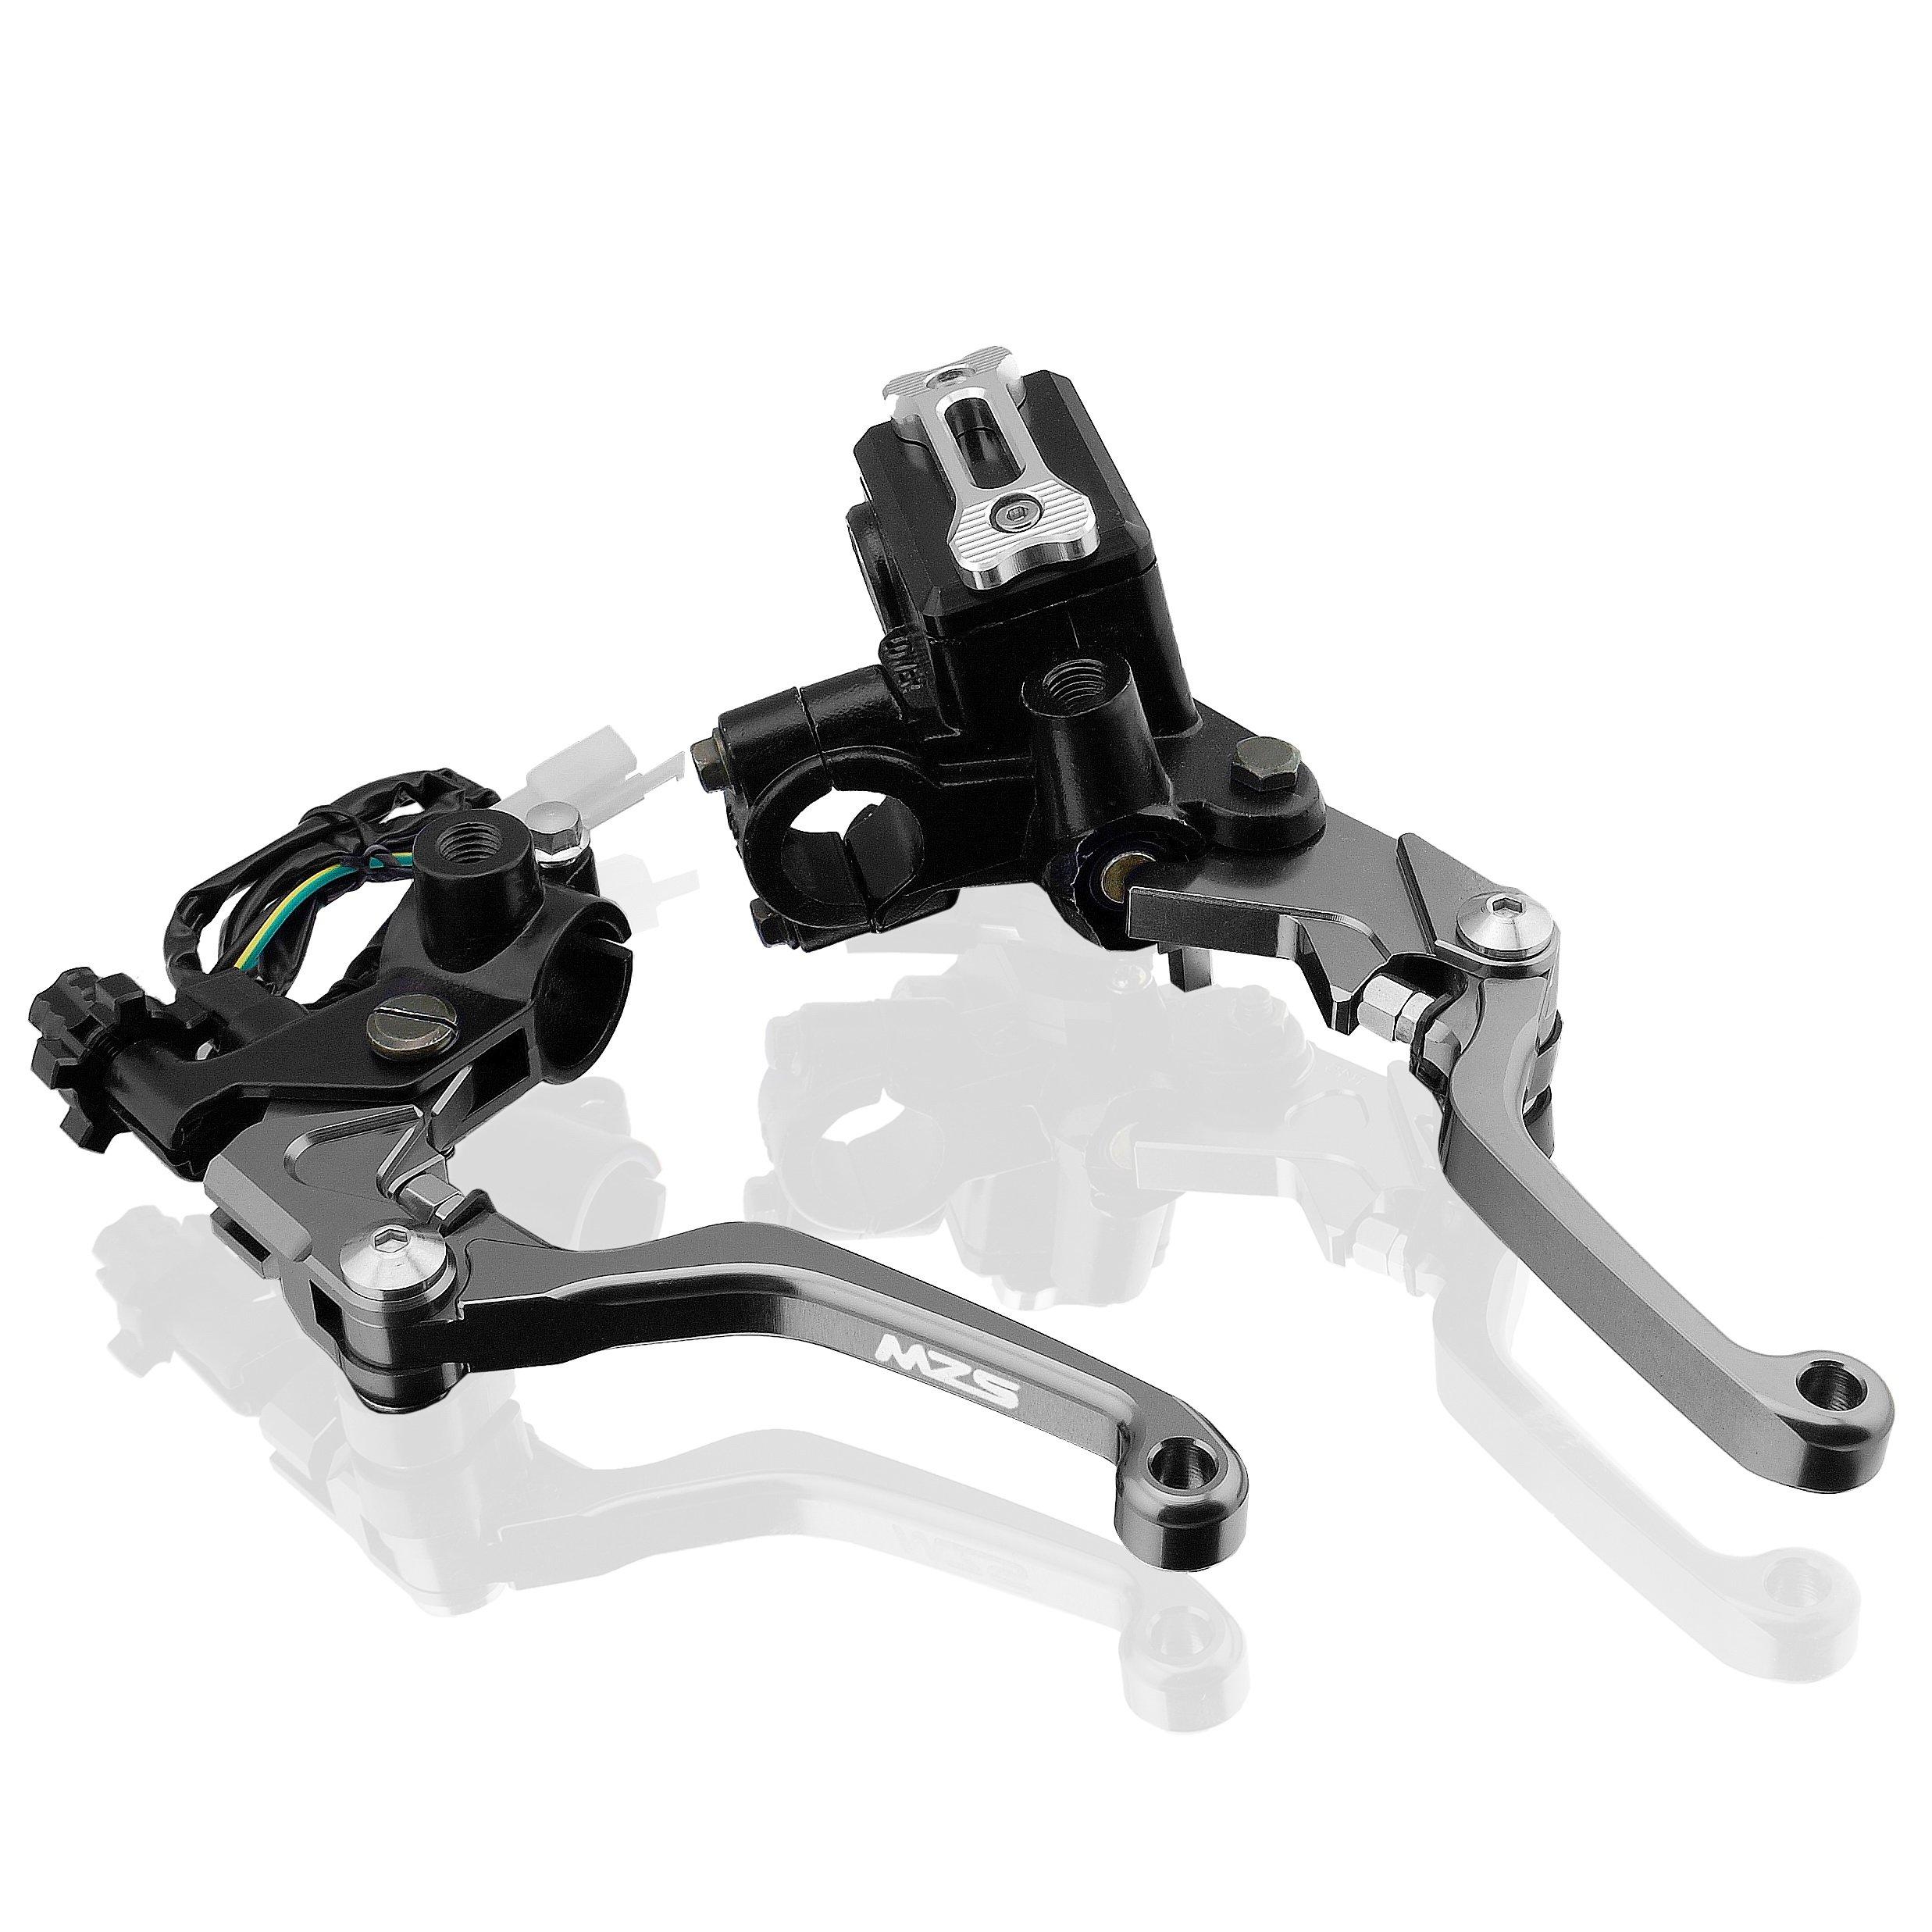 MZS 7/8 Brake Master Cylinder Reservoir Pivot Levers Set for Honda Yamaha Suzuki Kawasaki KTM (Gray) by MZS (Image #1)